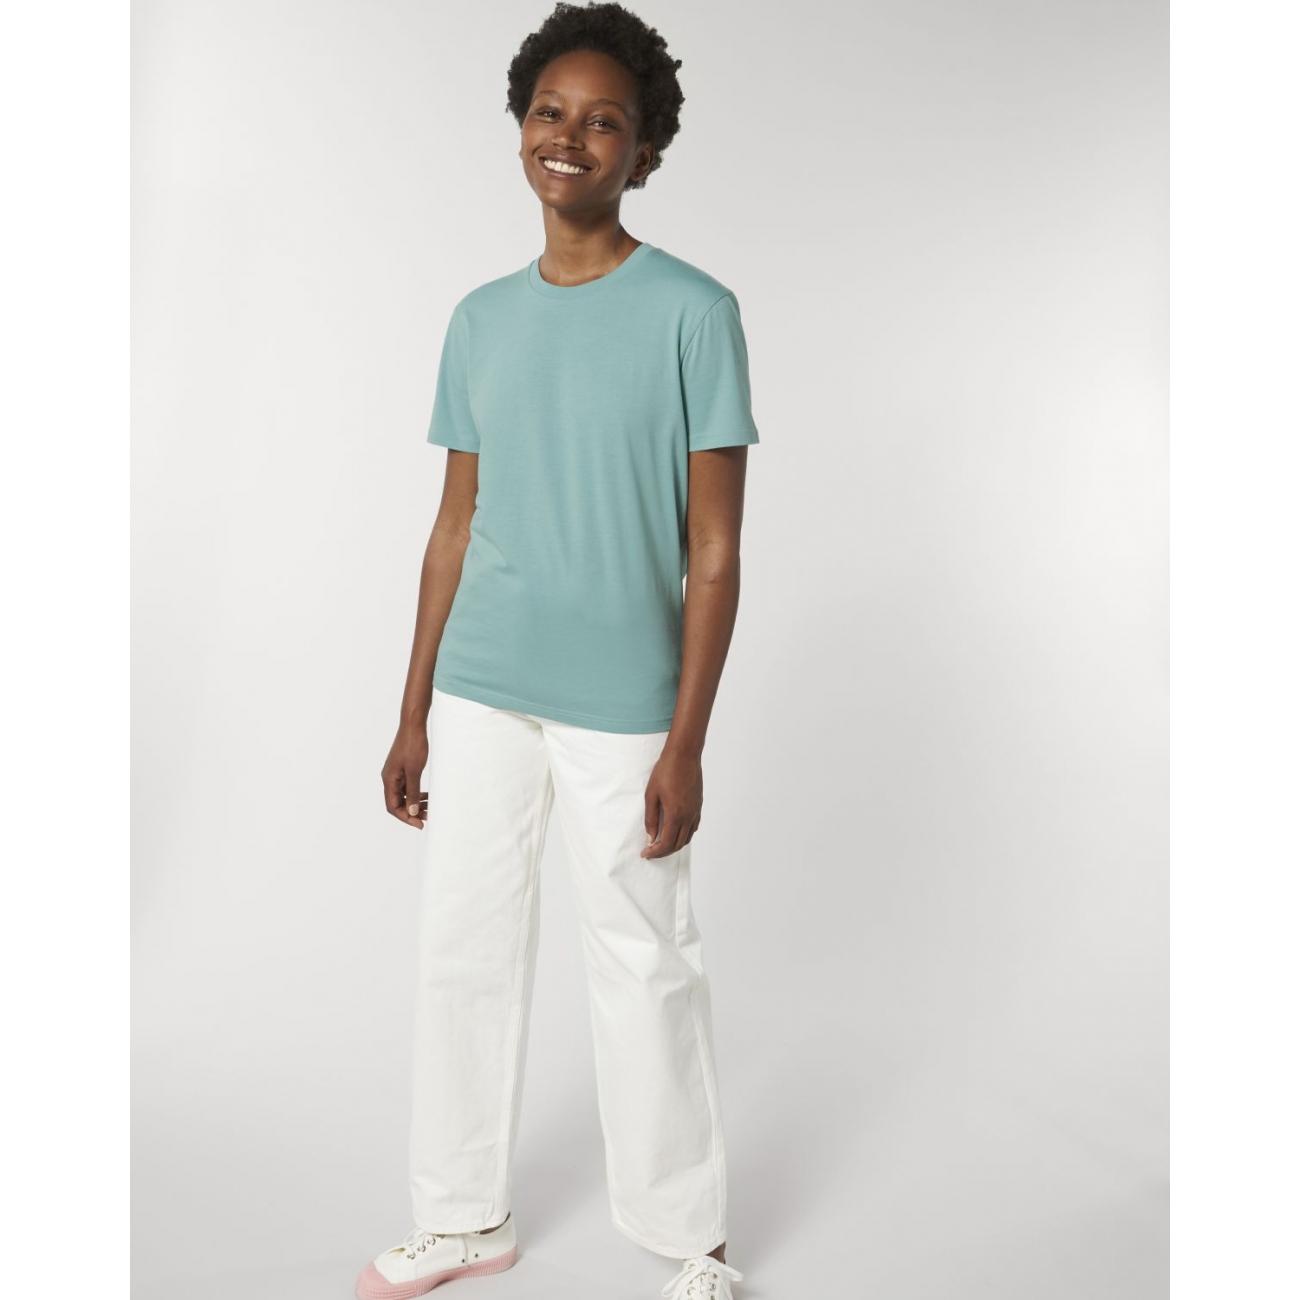 https://tee-shirt-bio.com/10672-thickbox_default/tee-shirt-femme-coton-bio-col-rond-coupe-classique-vert-d-eau-.jpg